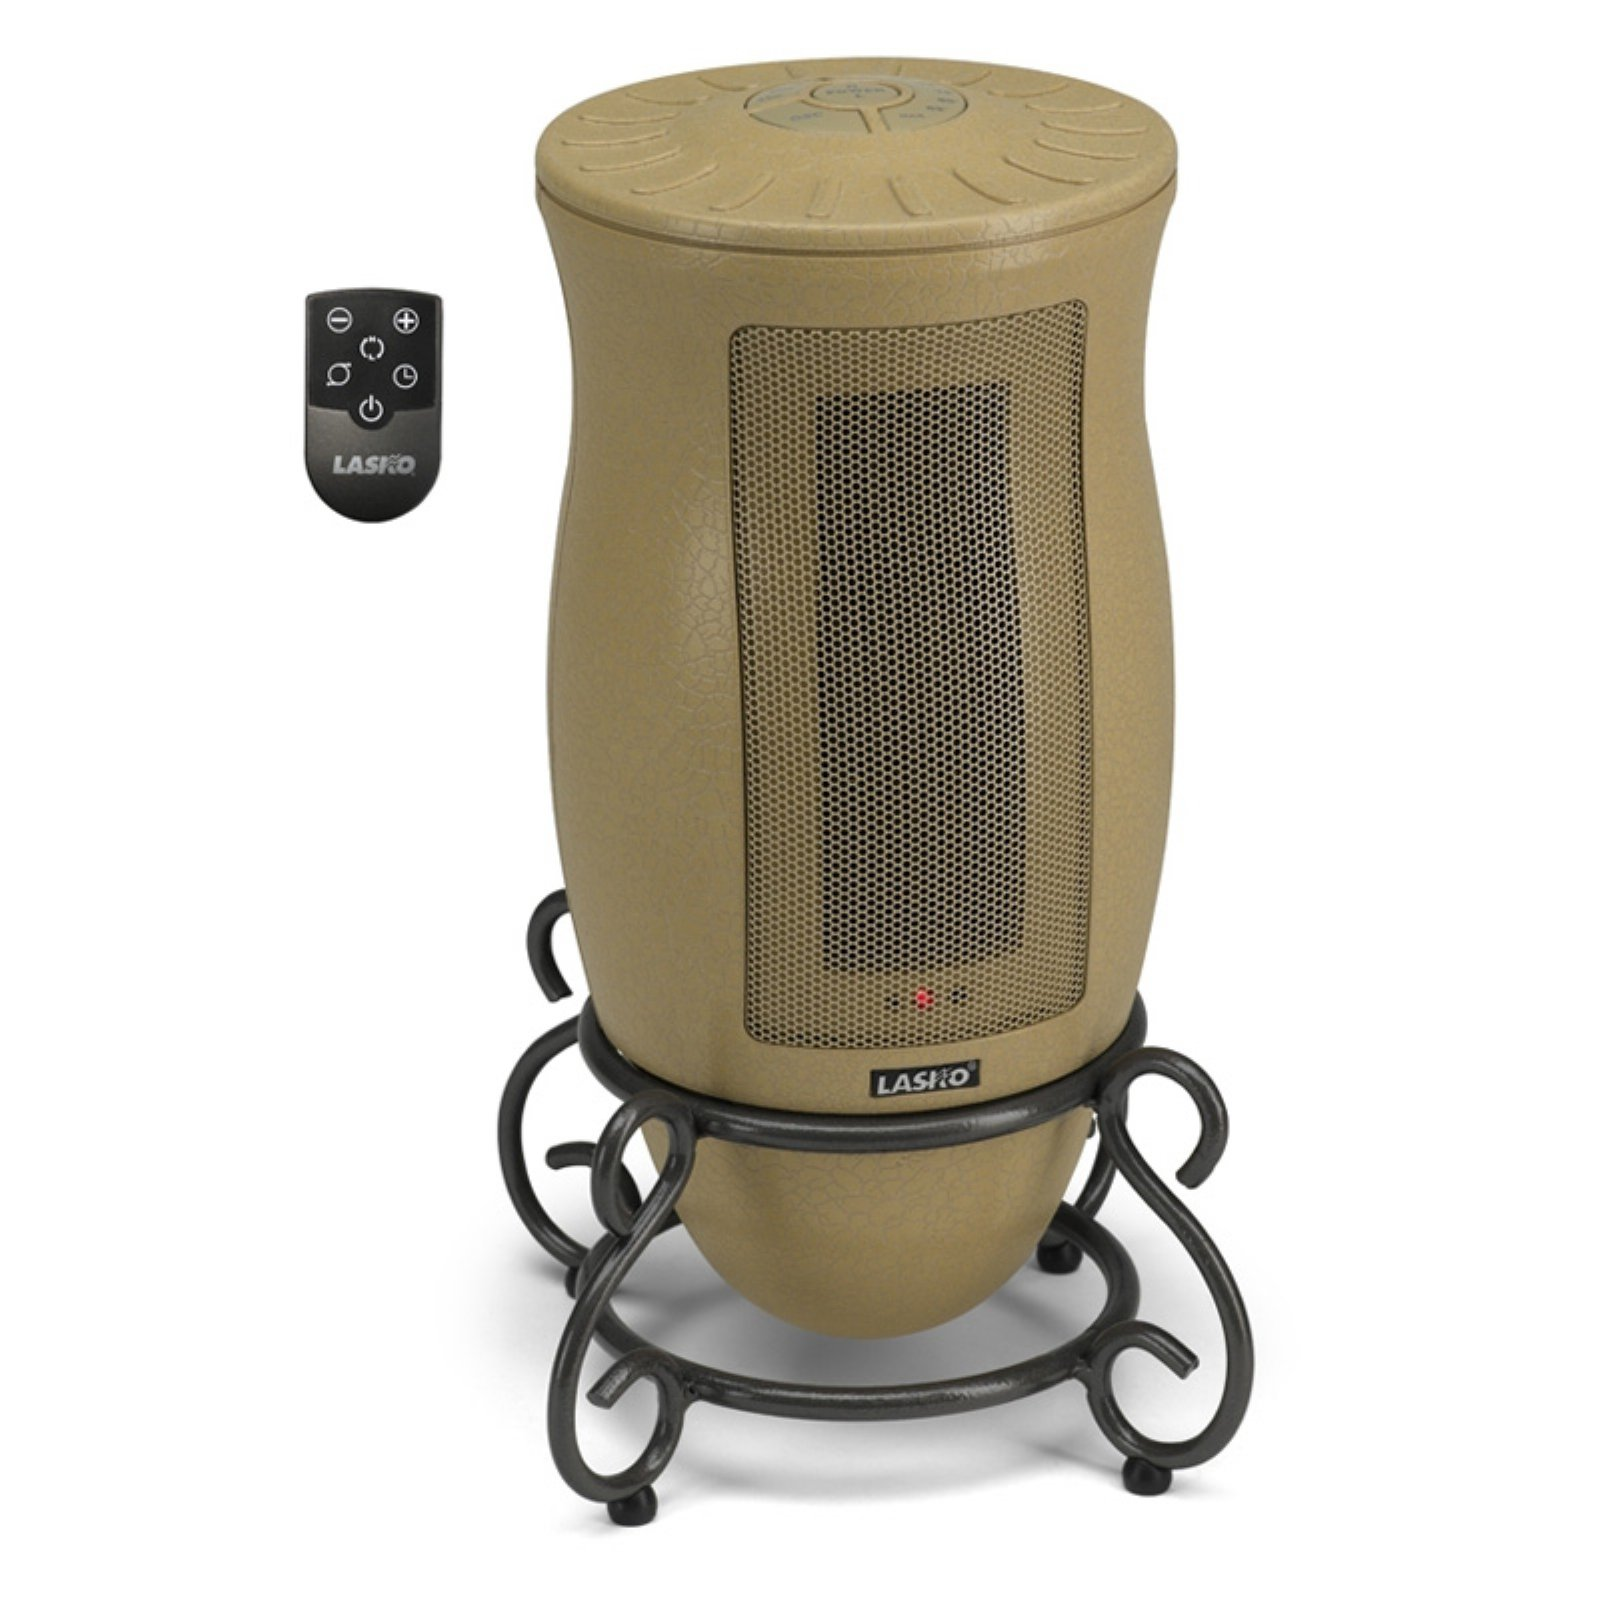 Lasko 6435 Designer Series Oscillating Ceramic Electric Space Heater by Lasko